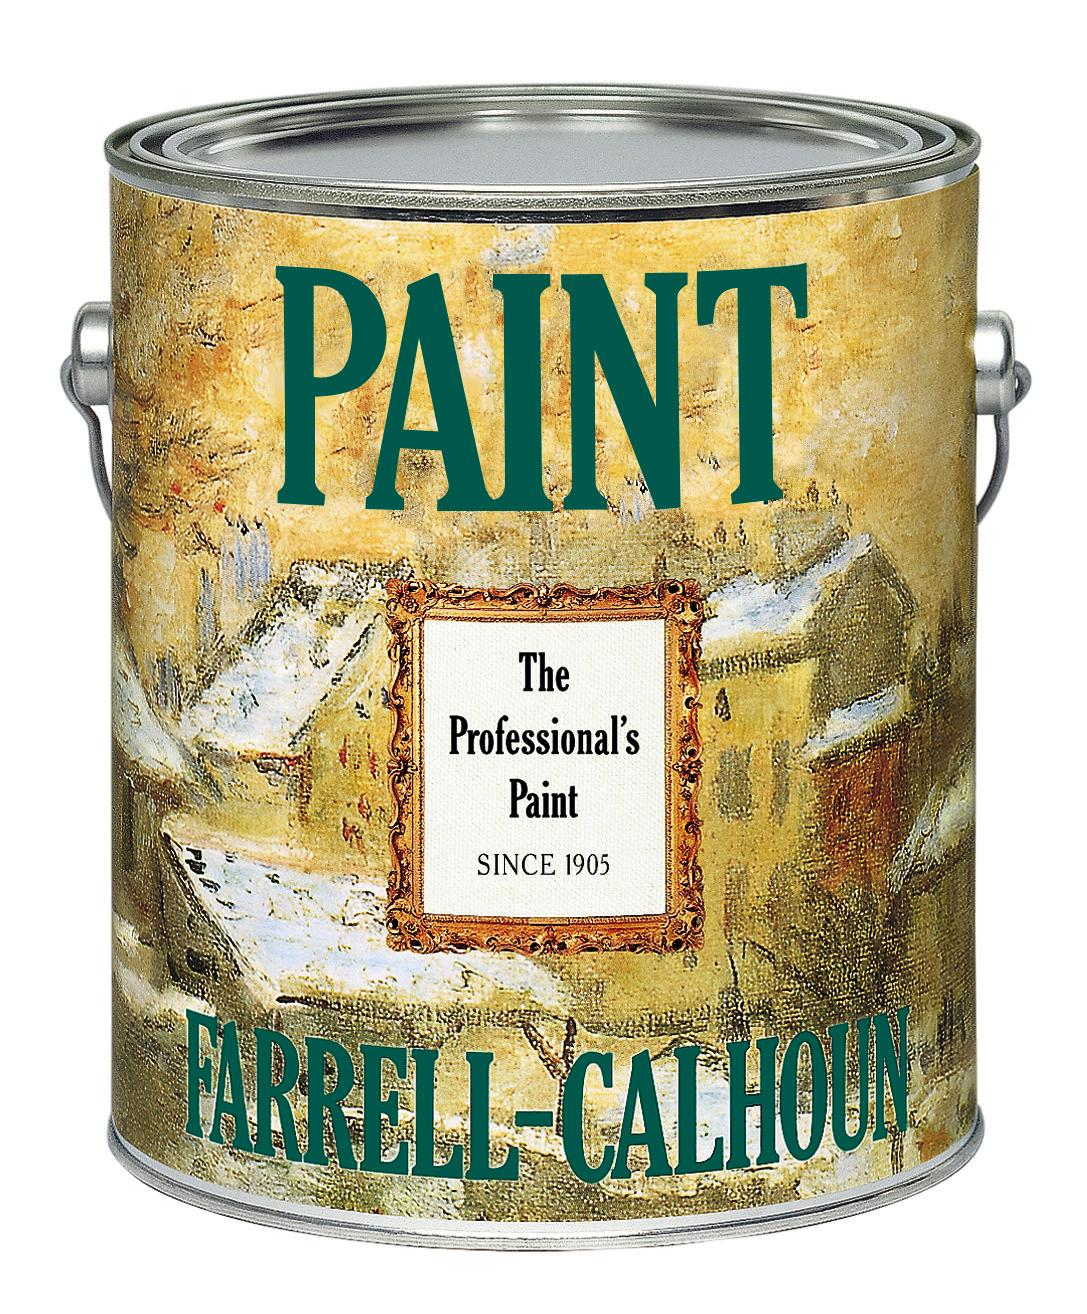 Farrell-Calhoun Paint image 1